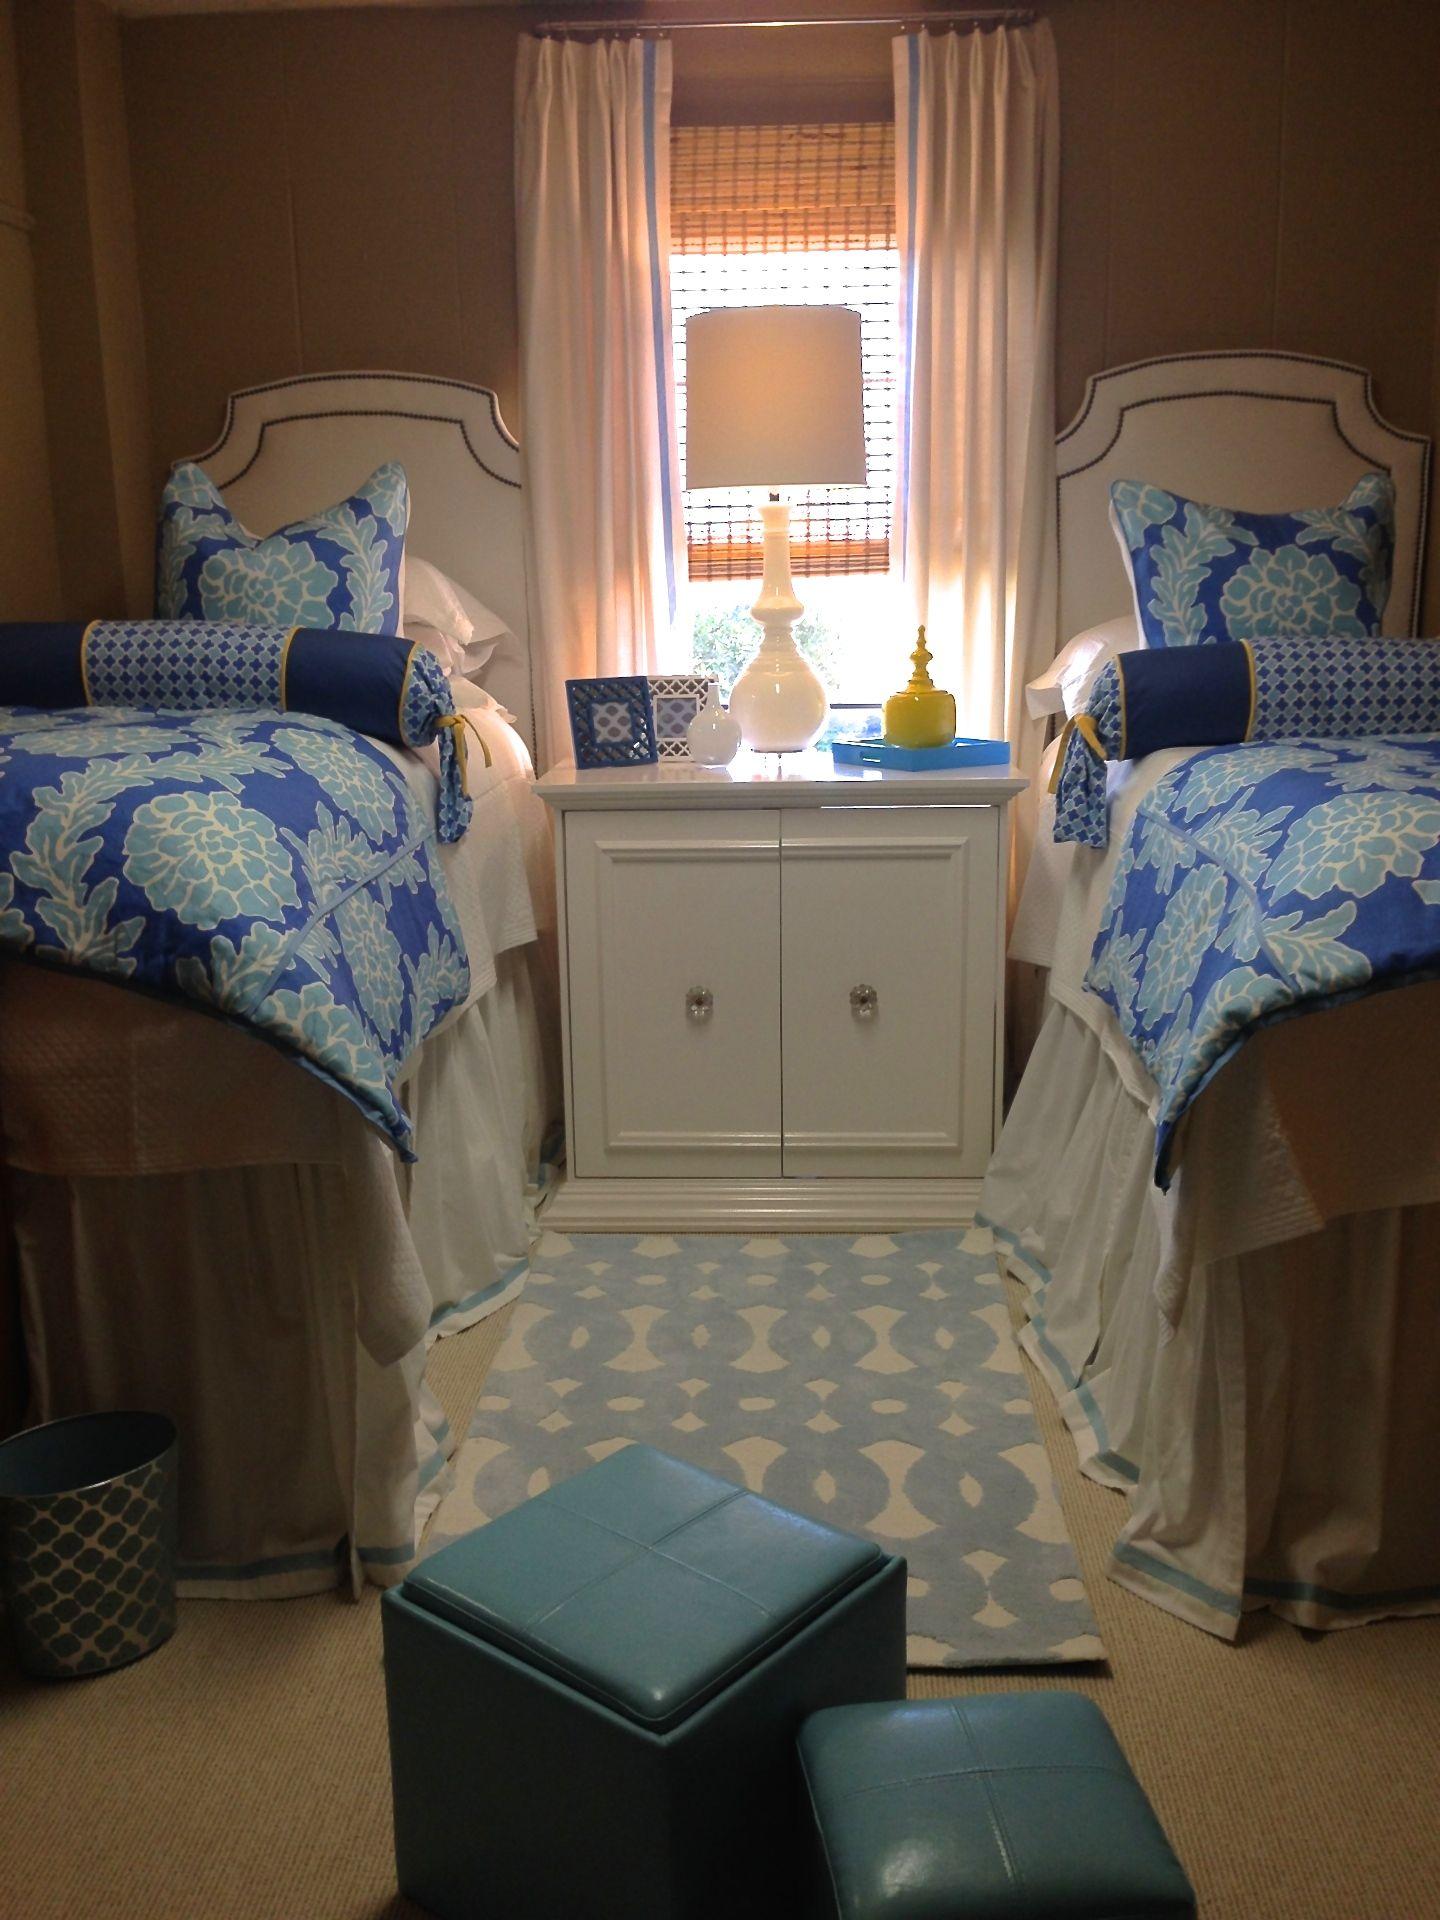 Pin von Mary Olive auf Kids rooms / Teen rooms | Pinterest ...